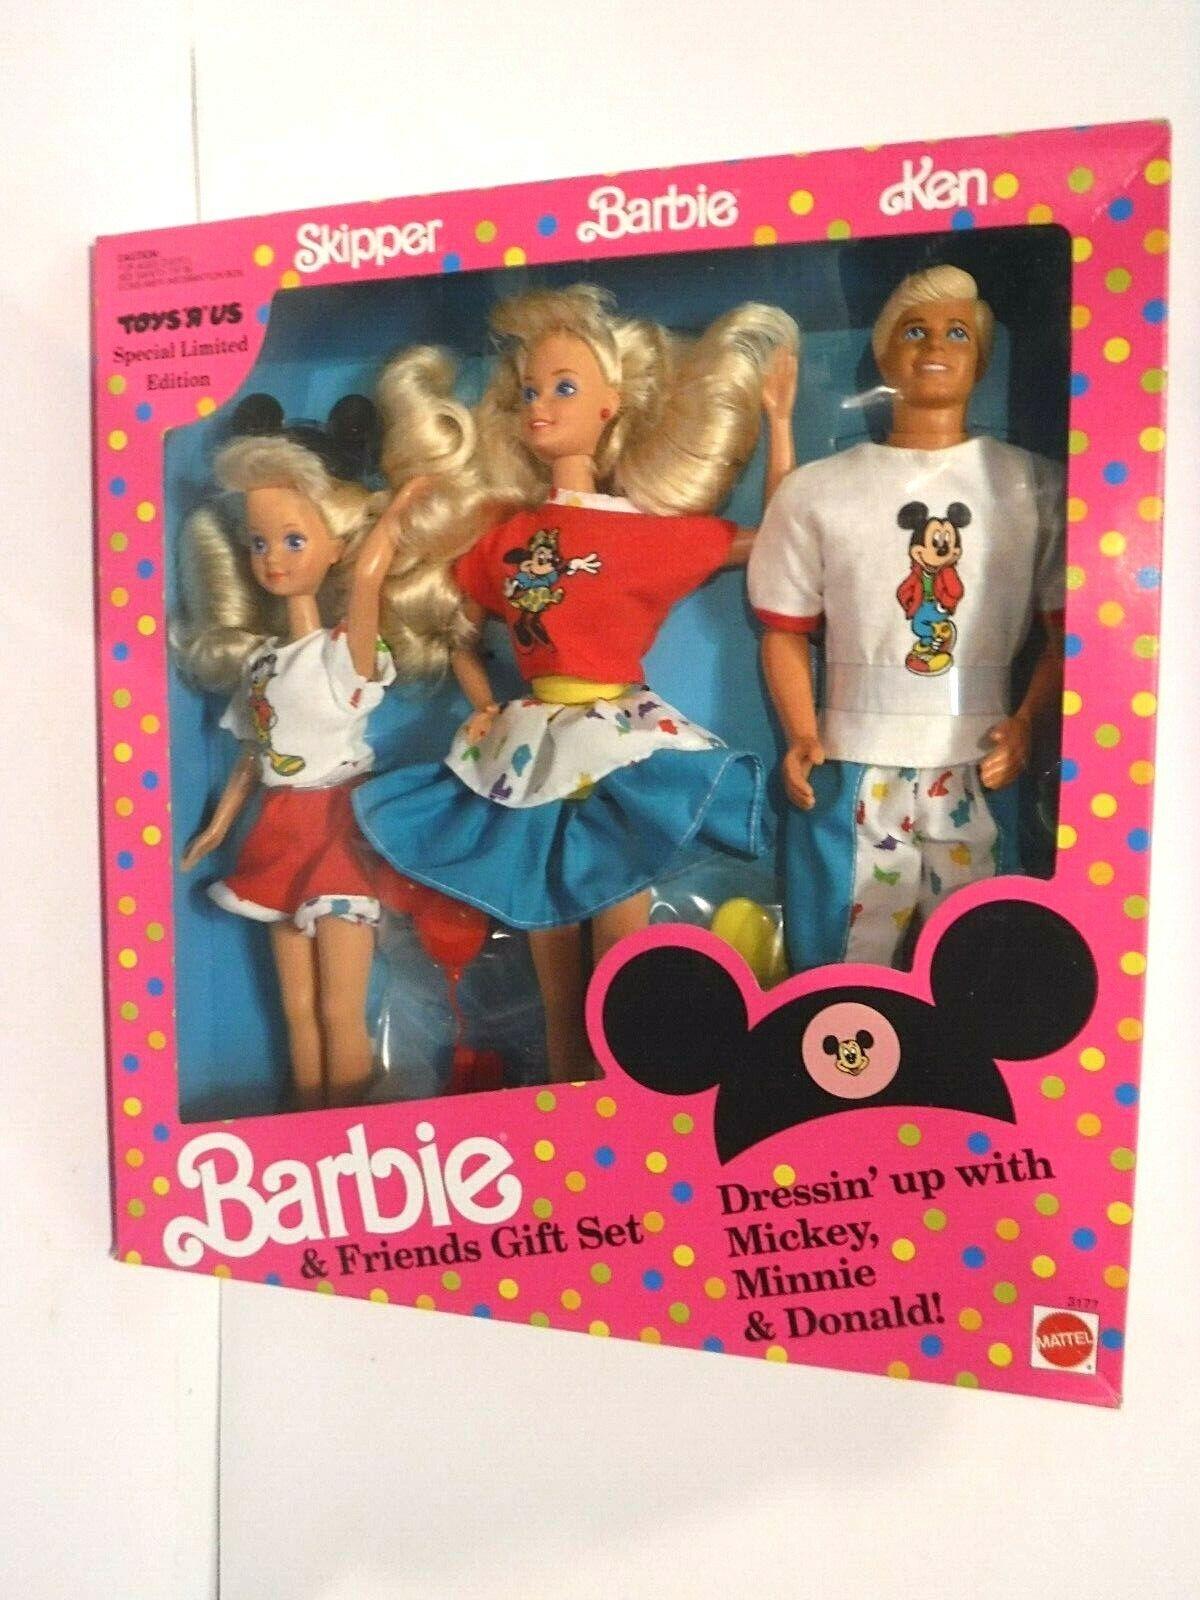 NEW BARBIE AND freunde Geschenk SET BARBIE-SpielzeugS 'R US speziell LTD. EDIT -1991-MNRFB